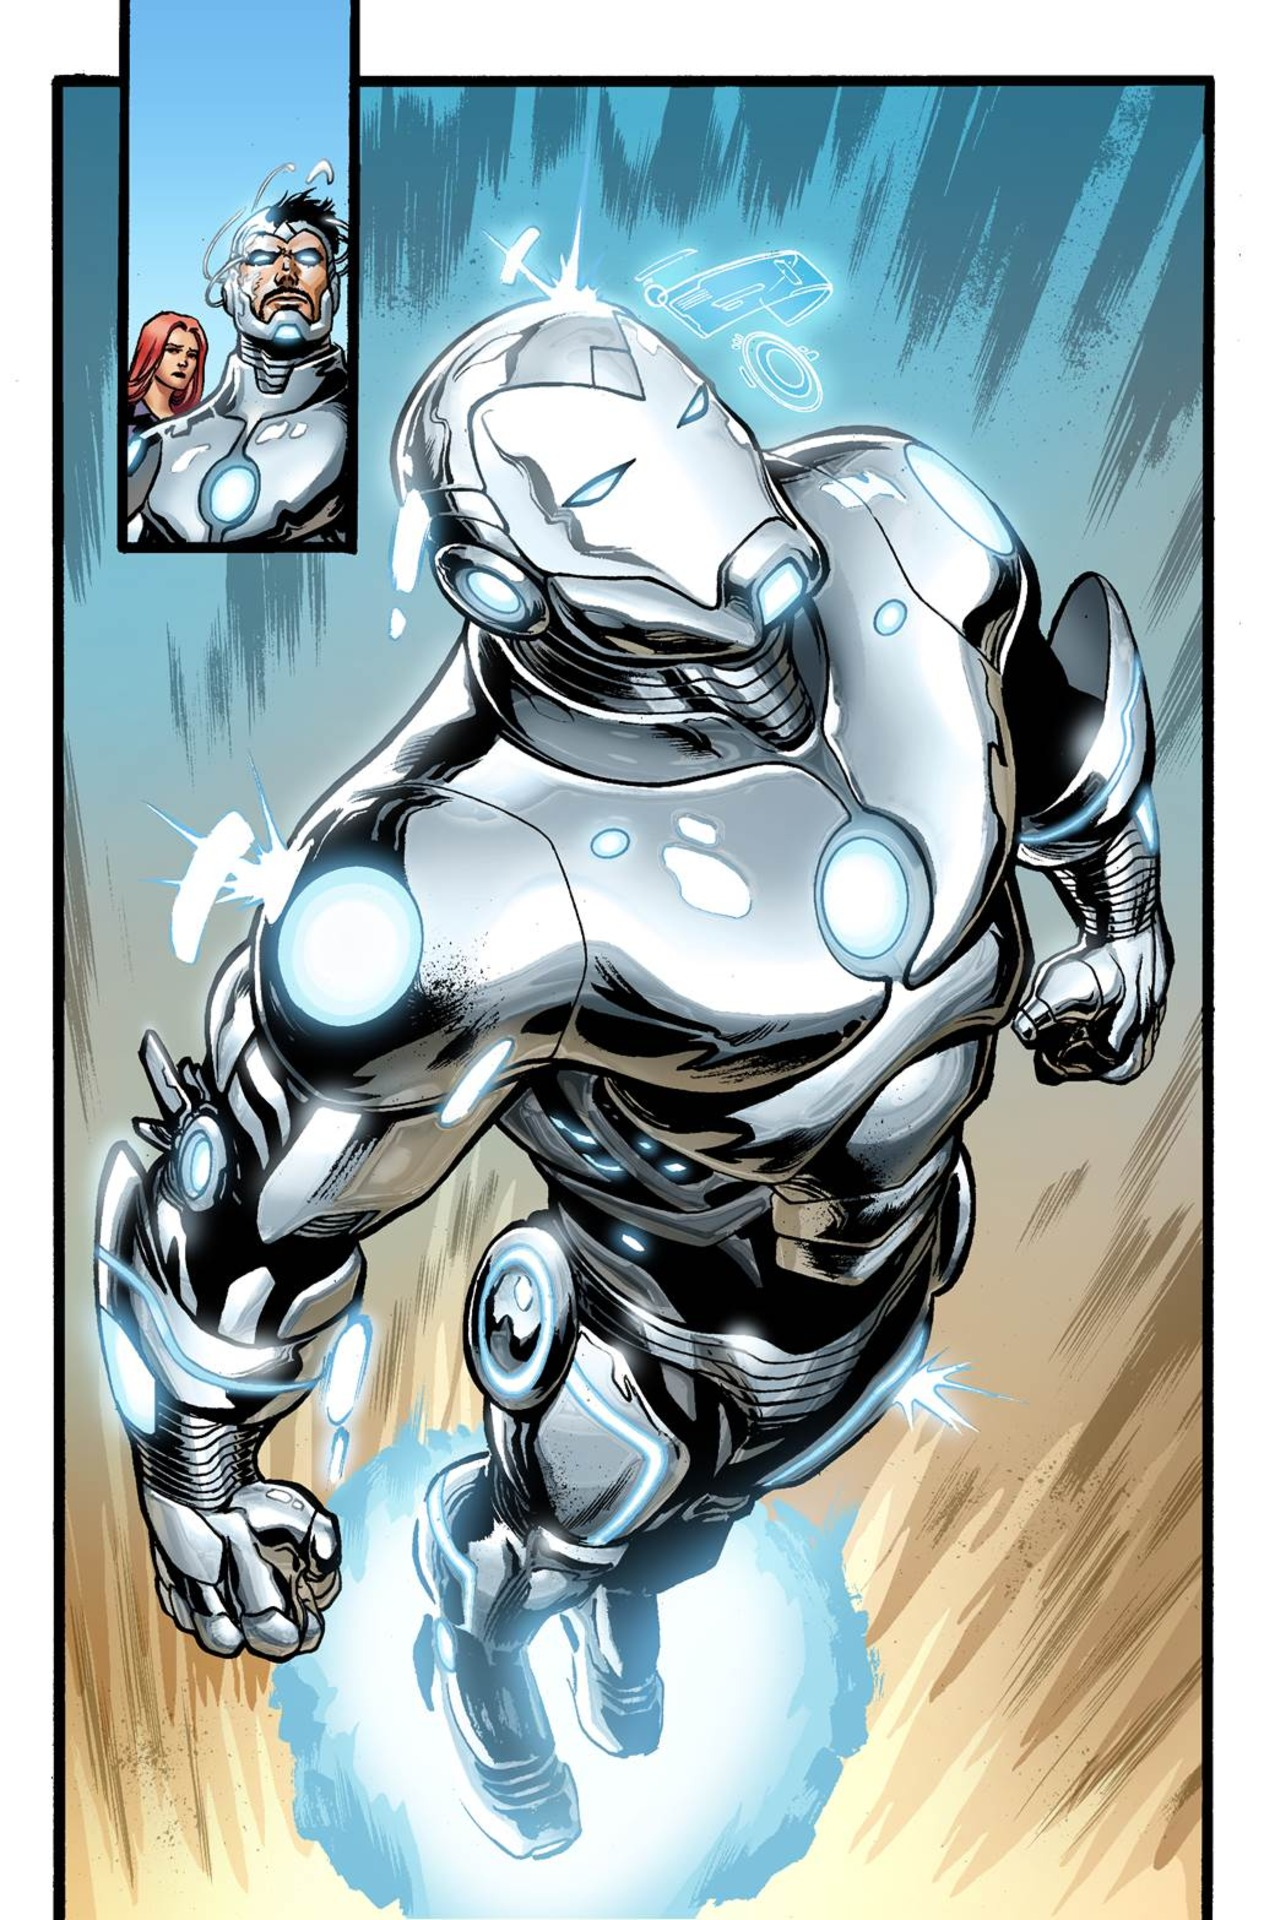 Superior Iron Man Backgrounds, Compatible - PC, Mobile, Gadgets| 1264x1920 px